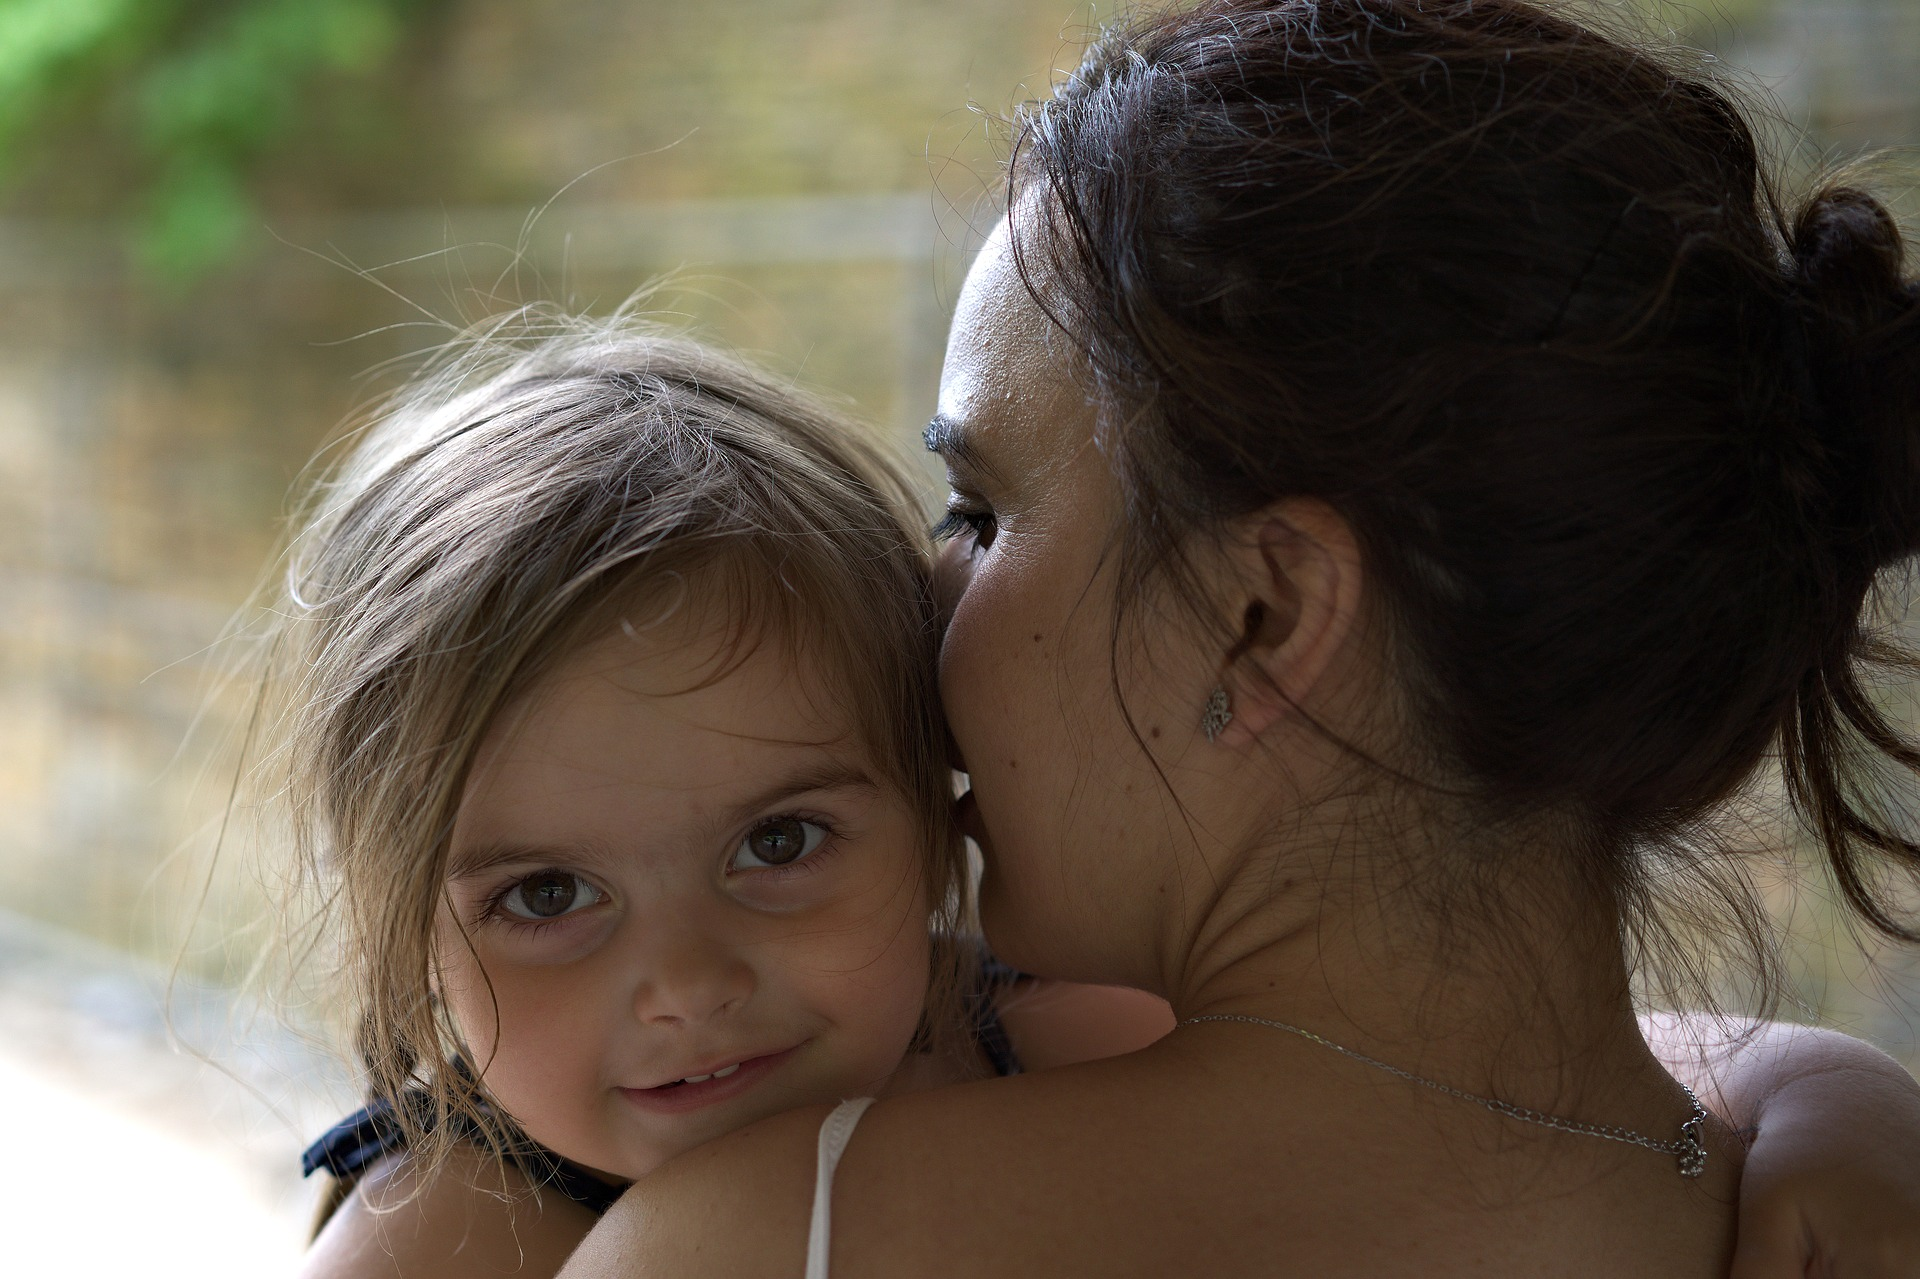 child-and-mom-2356369_1920.jpg